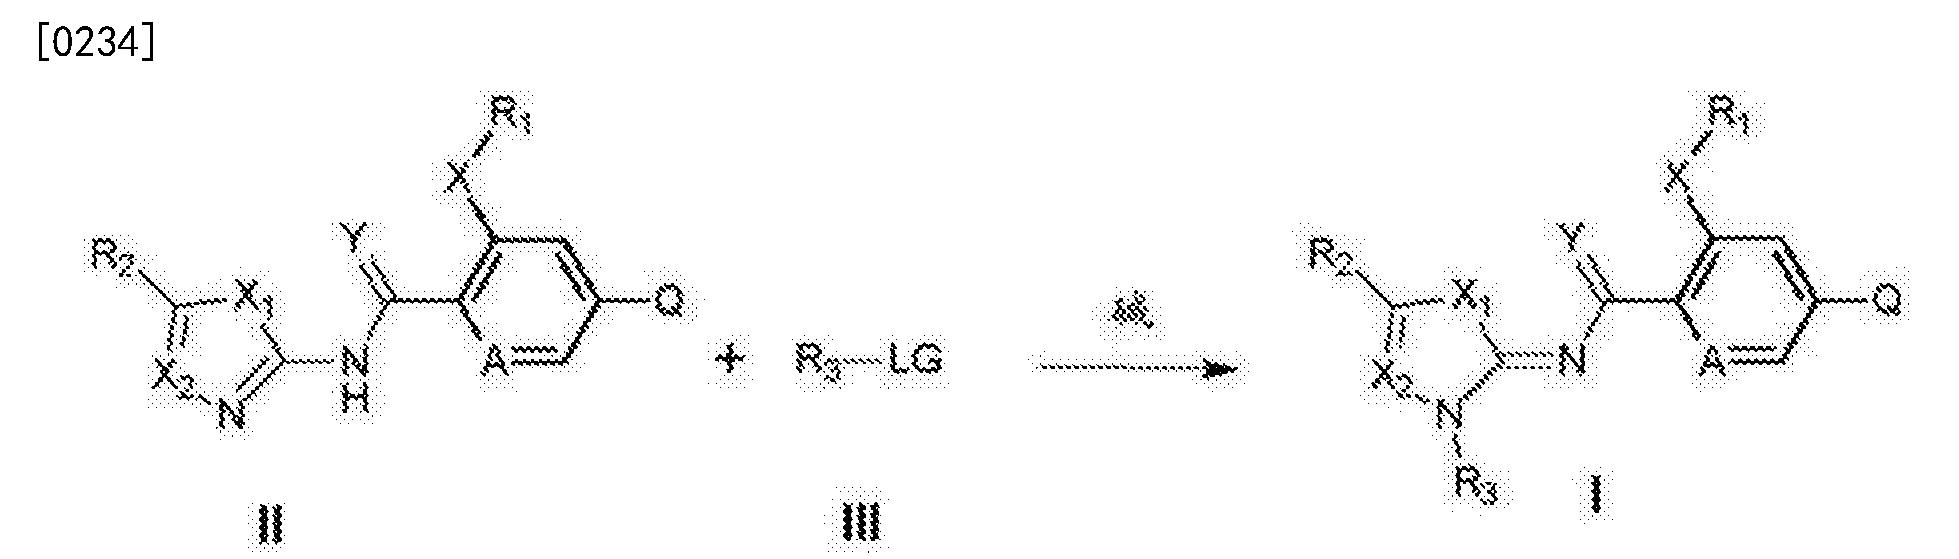 Cn107108568a Pesticidally Active Amide Heterocyclic Derivatives Wooden Clock Bamboo 1293 Red Lightblue Lightgreen Light Figure Cn107108568ad00321